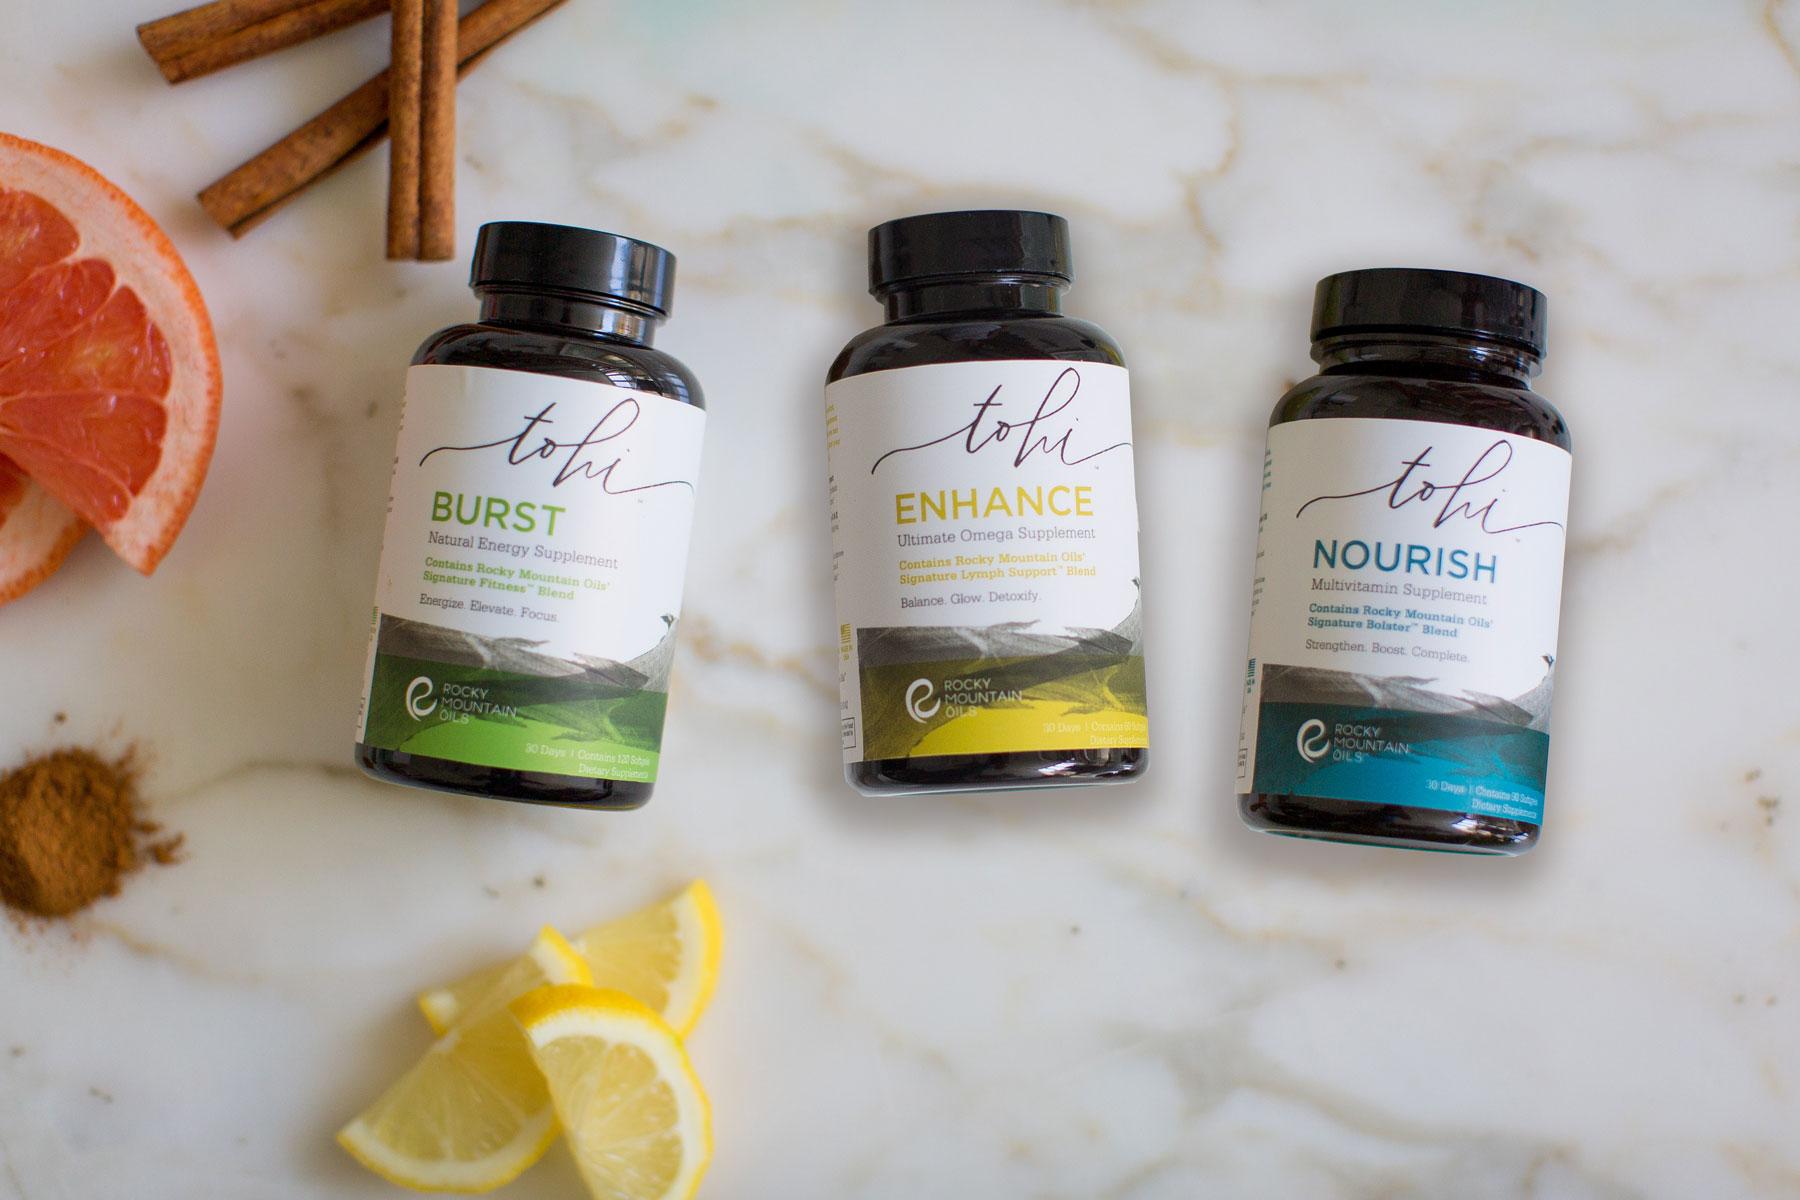 Rocky mountain oils clipart jpg free stock Tohi Supplements | Rocky Mountain Oils jpg free stock